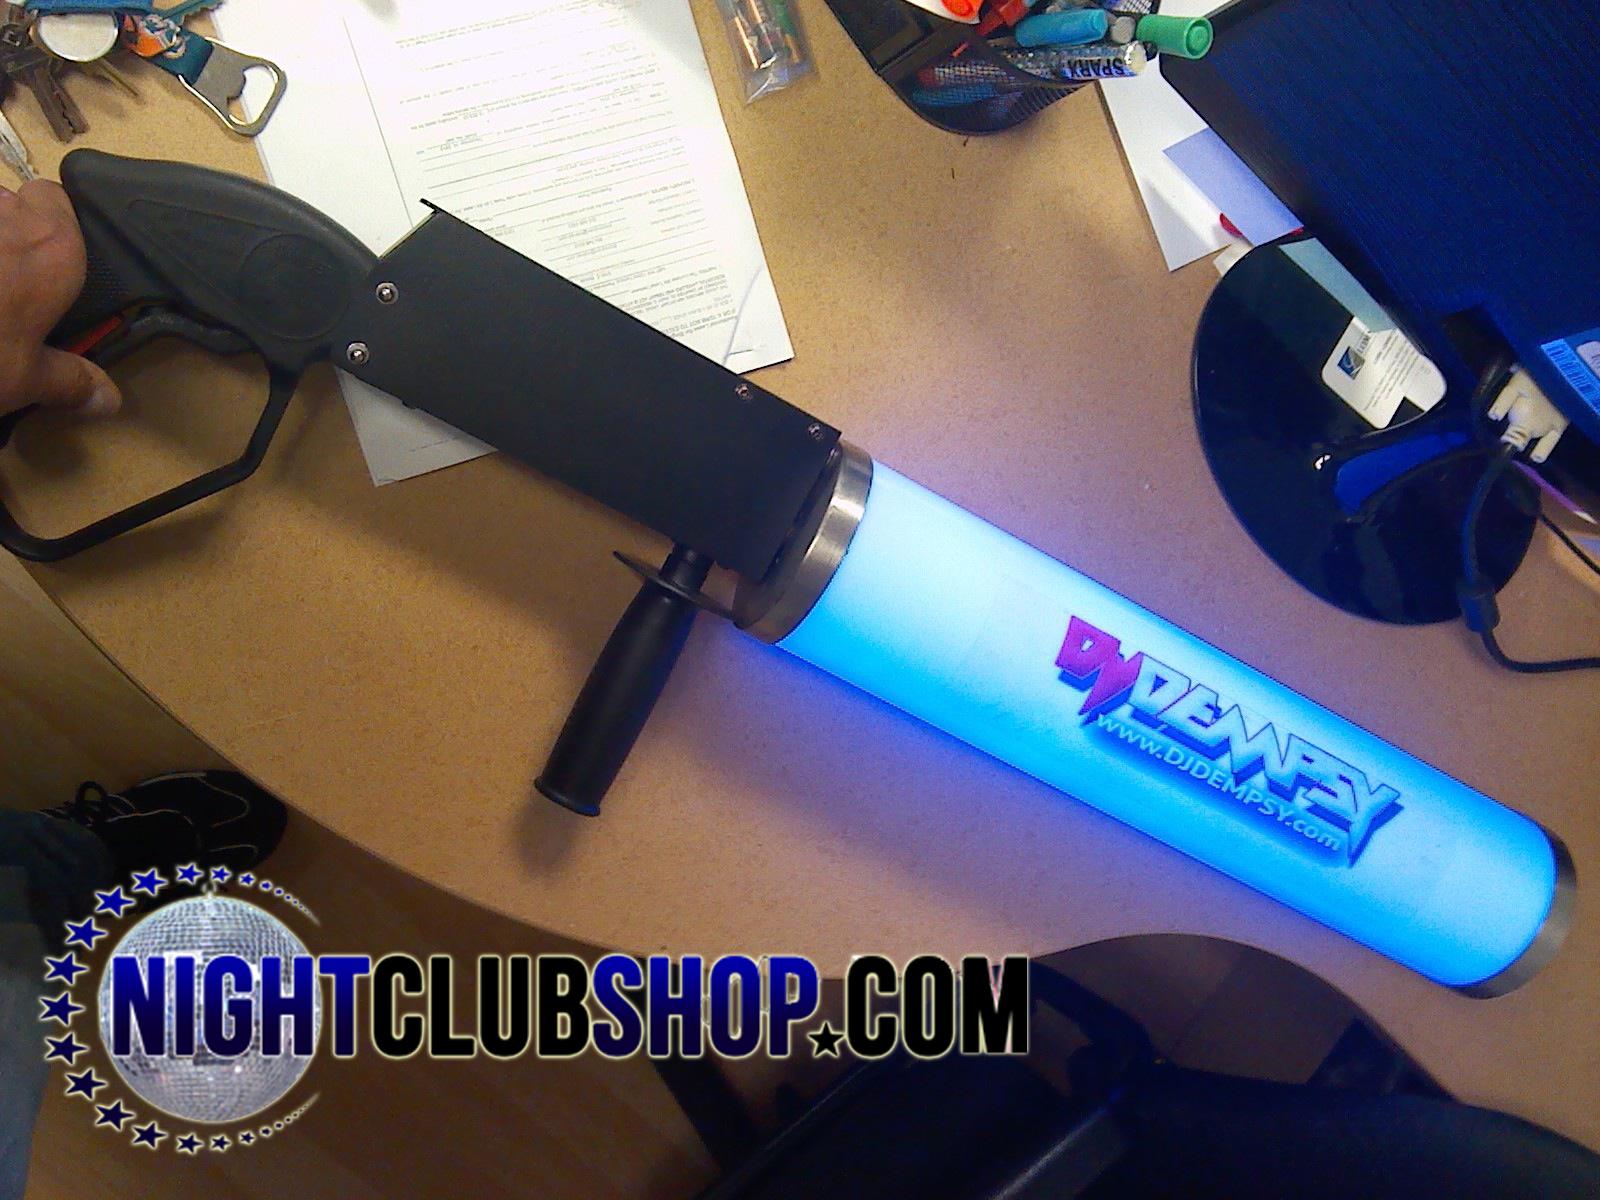 dj-led-co2-cannon-customized.jpg